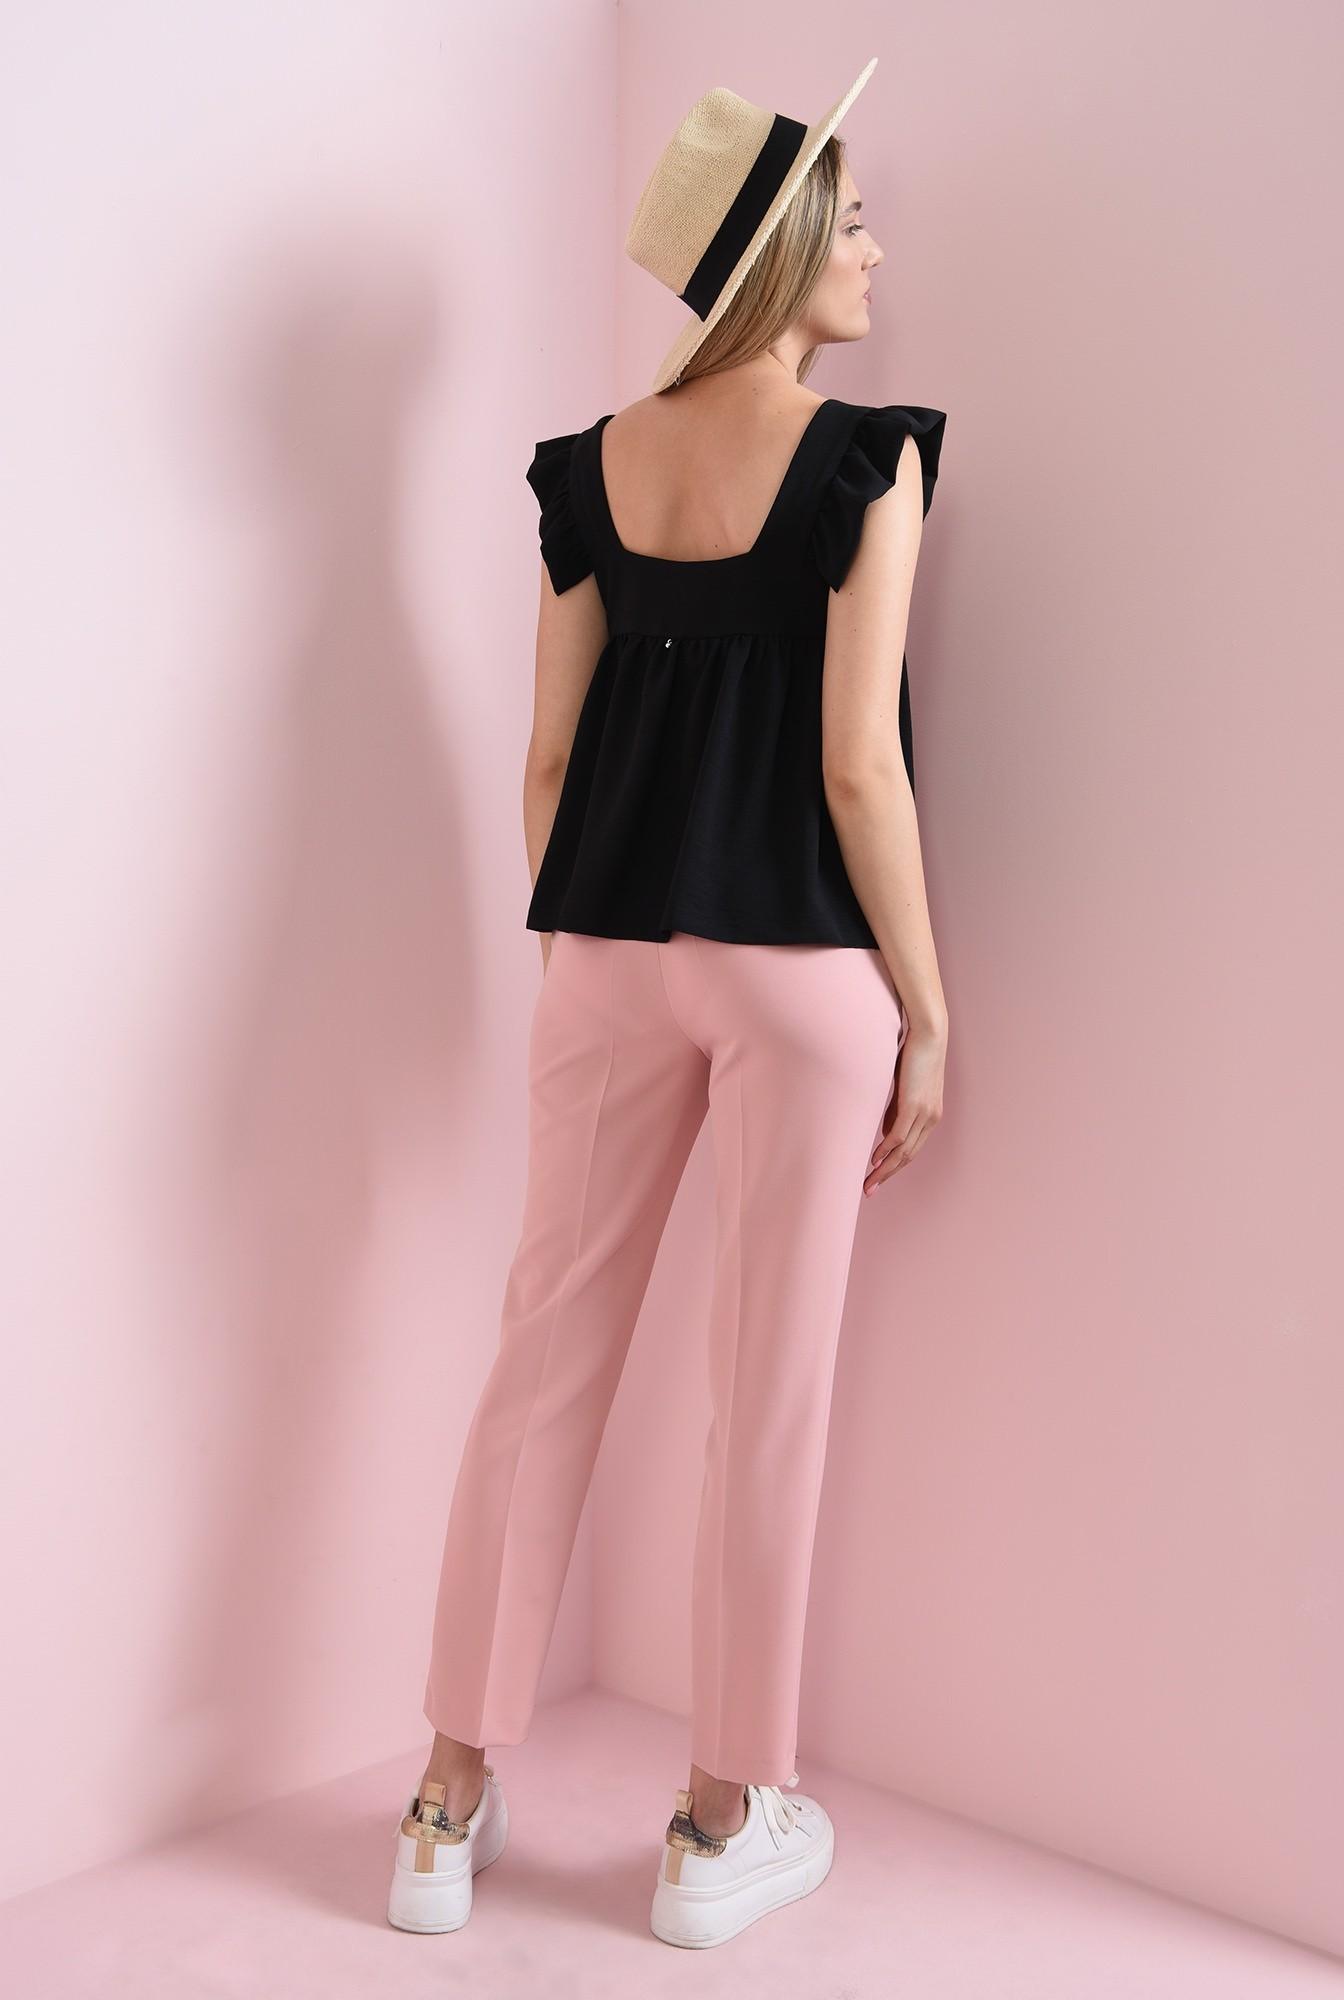 1 - pantaloni casual, roz, cu buzunar decorativ